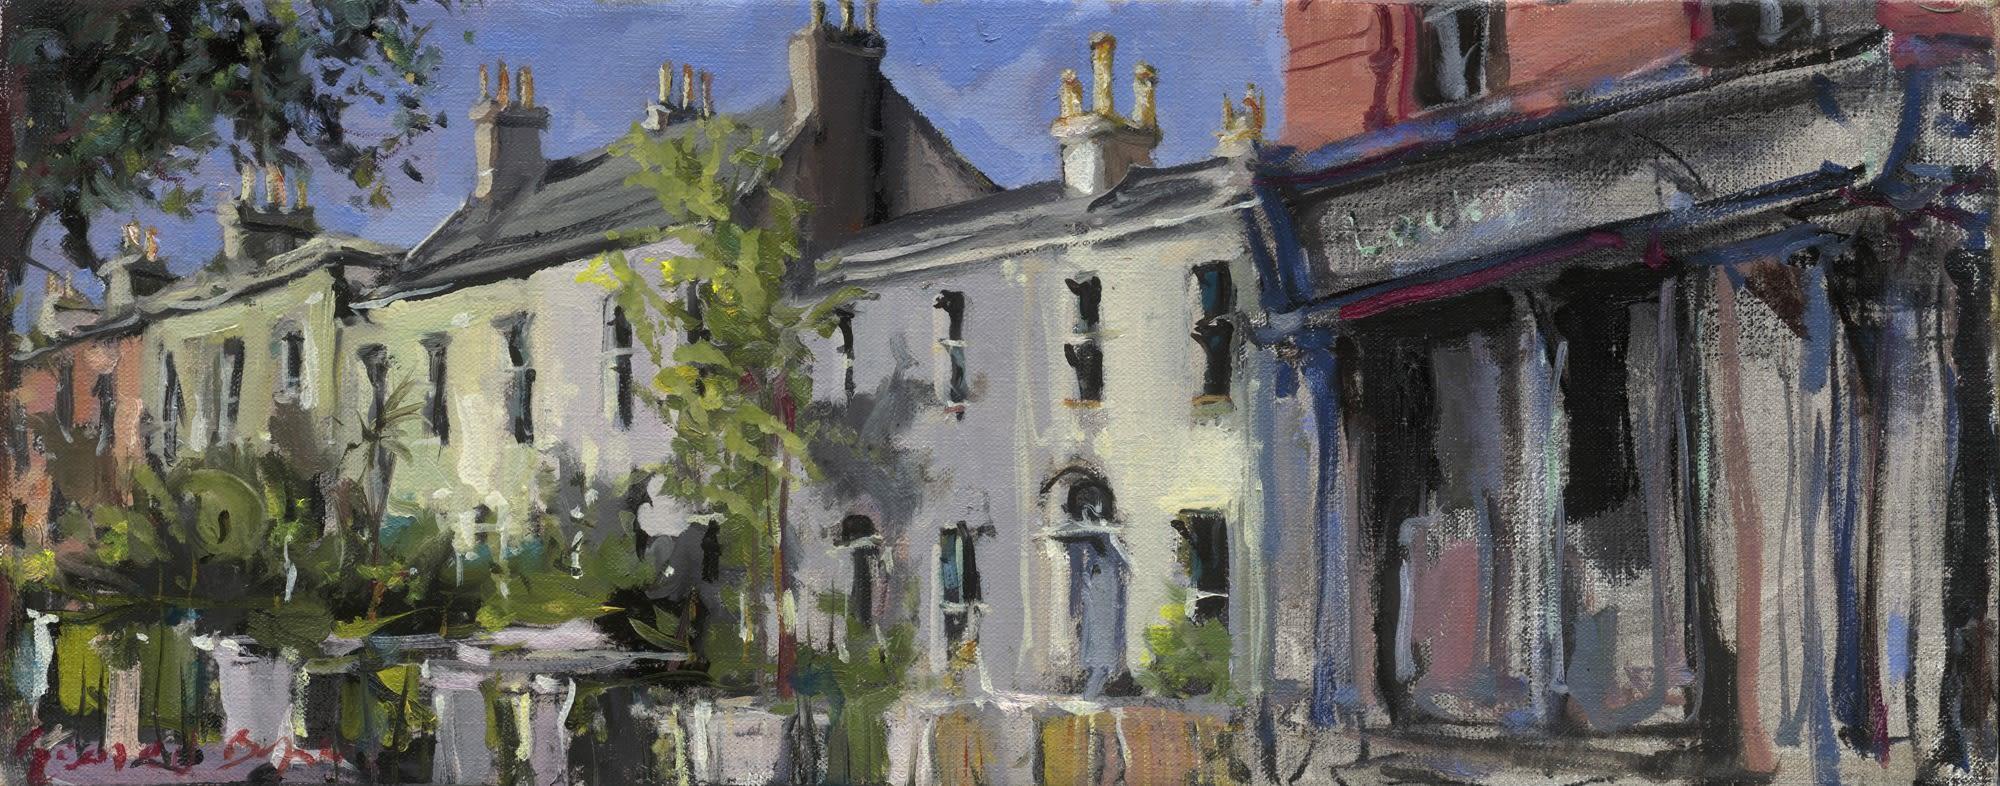 Gerard_Byrne_Blissful_Journey_Fine_Art_Print_Irish_Contemporary_Artist_Scoop_Art_Auction